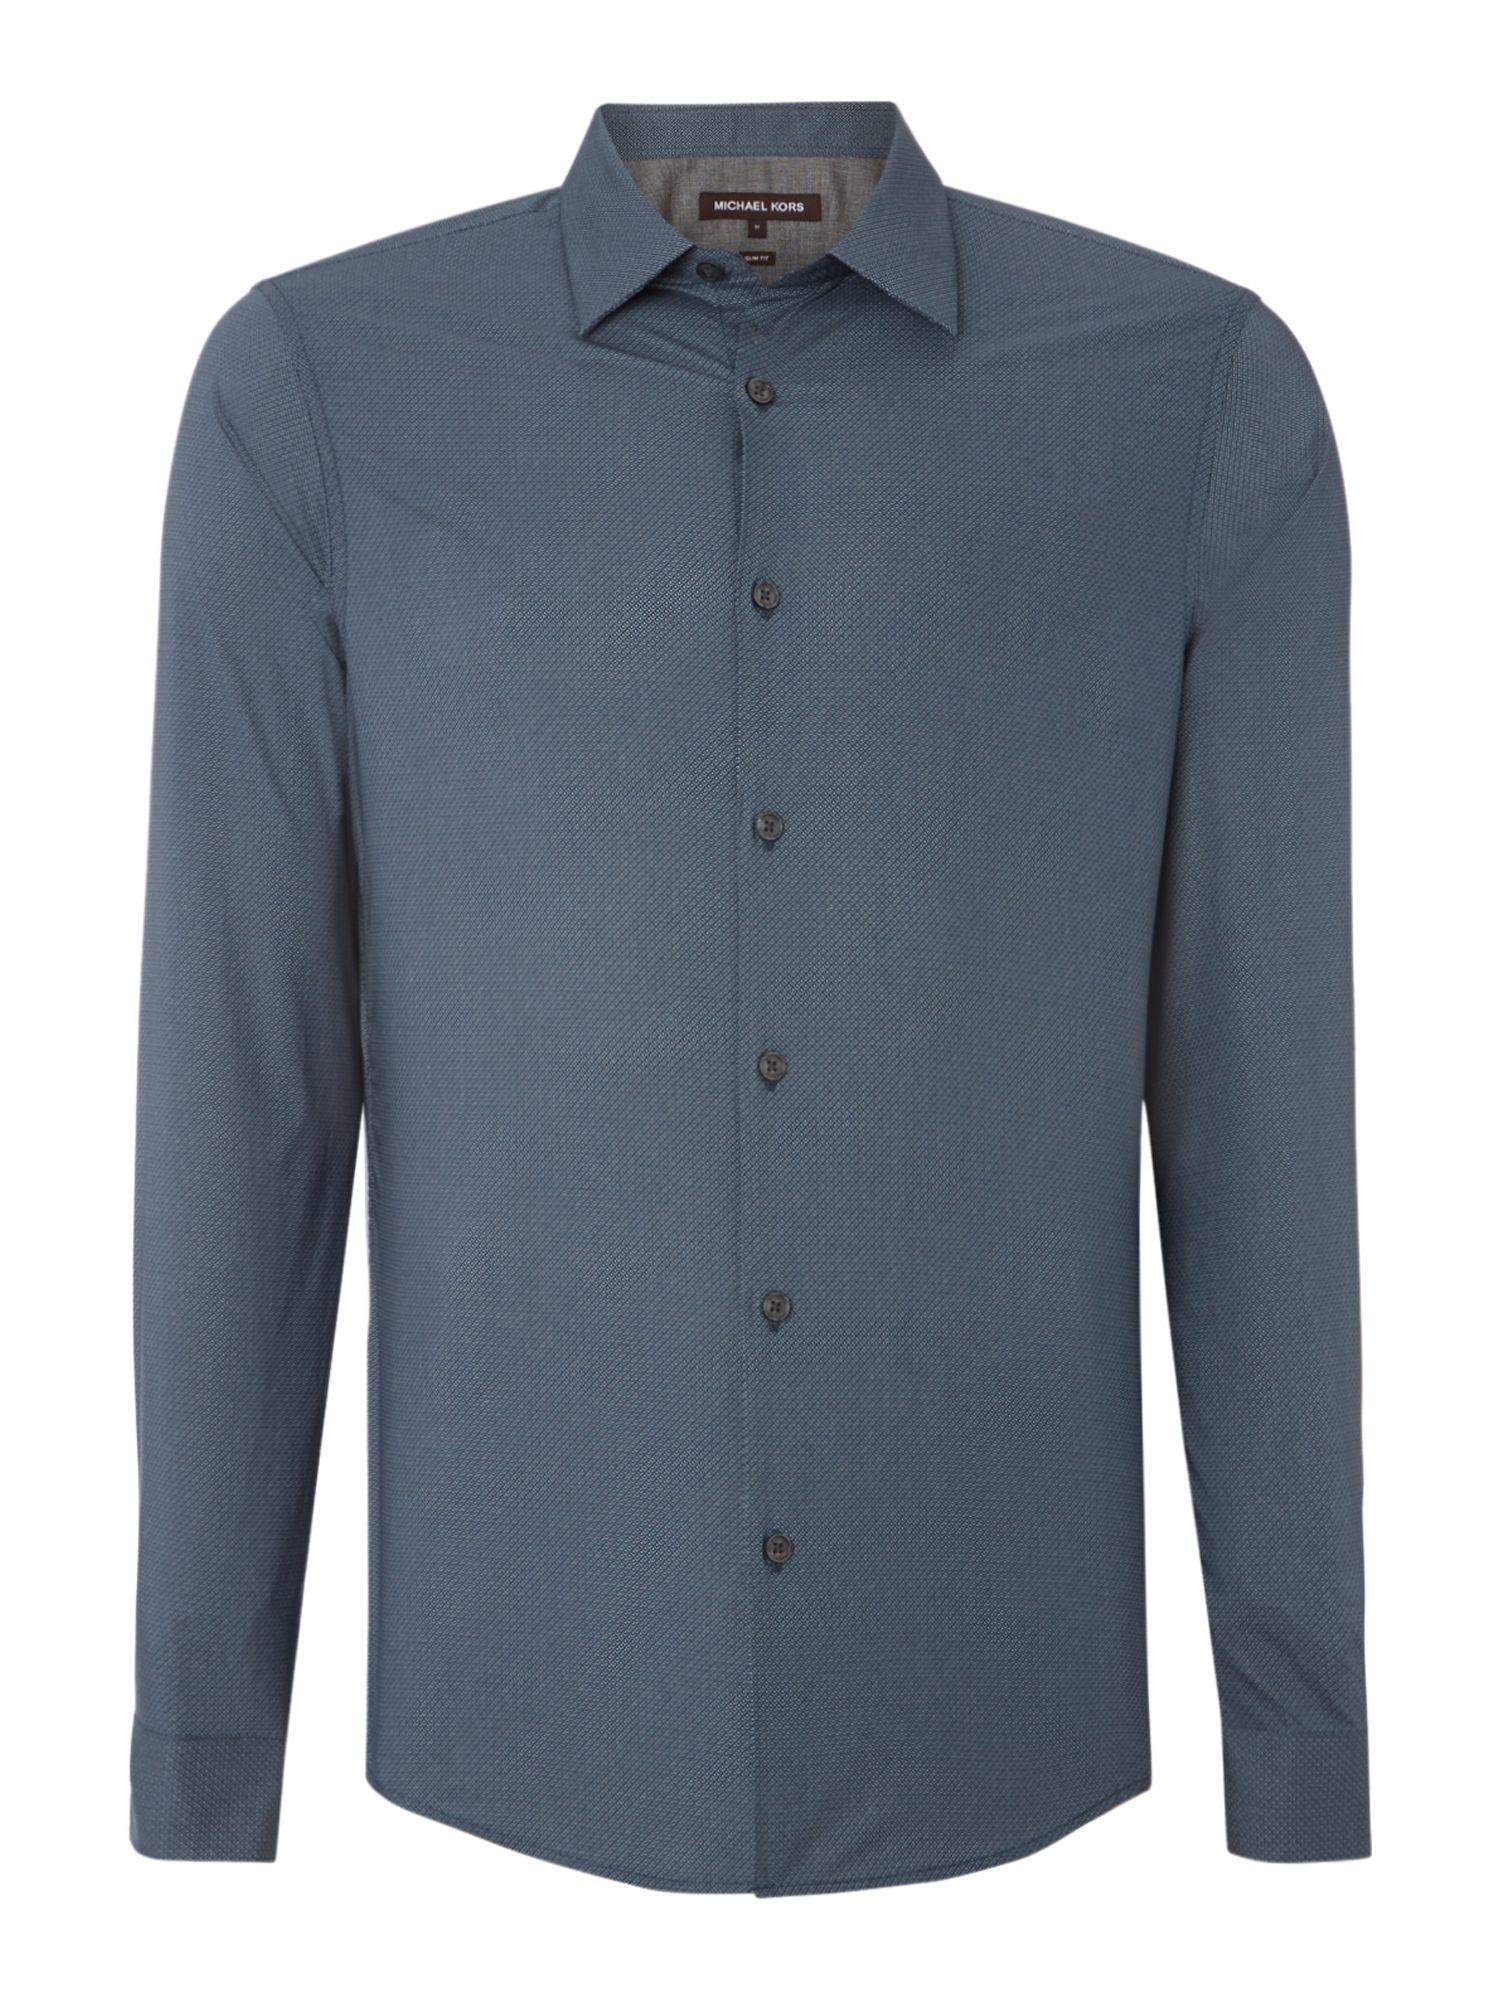 Michael Kors Pattern Slim Fit Long Sleeve Button Down